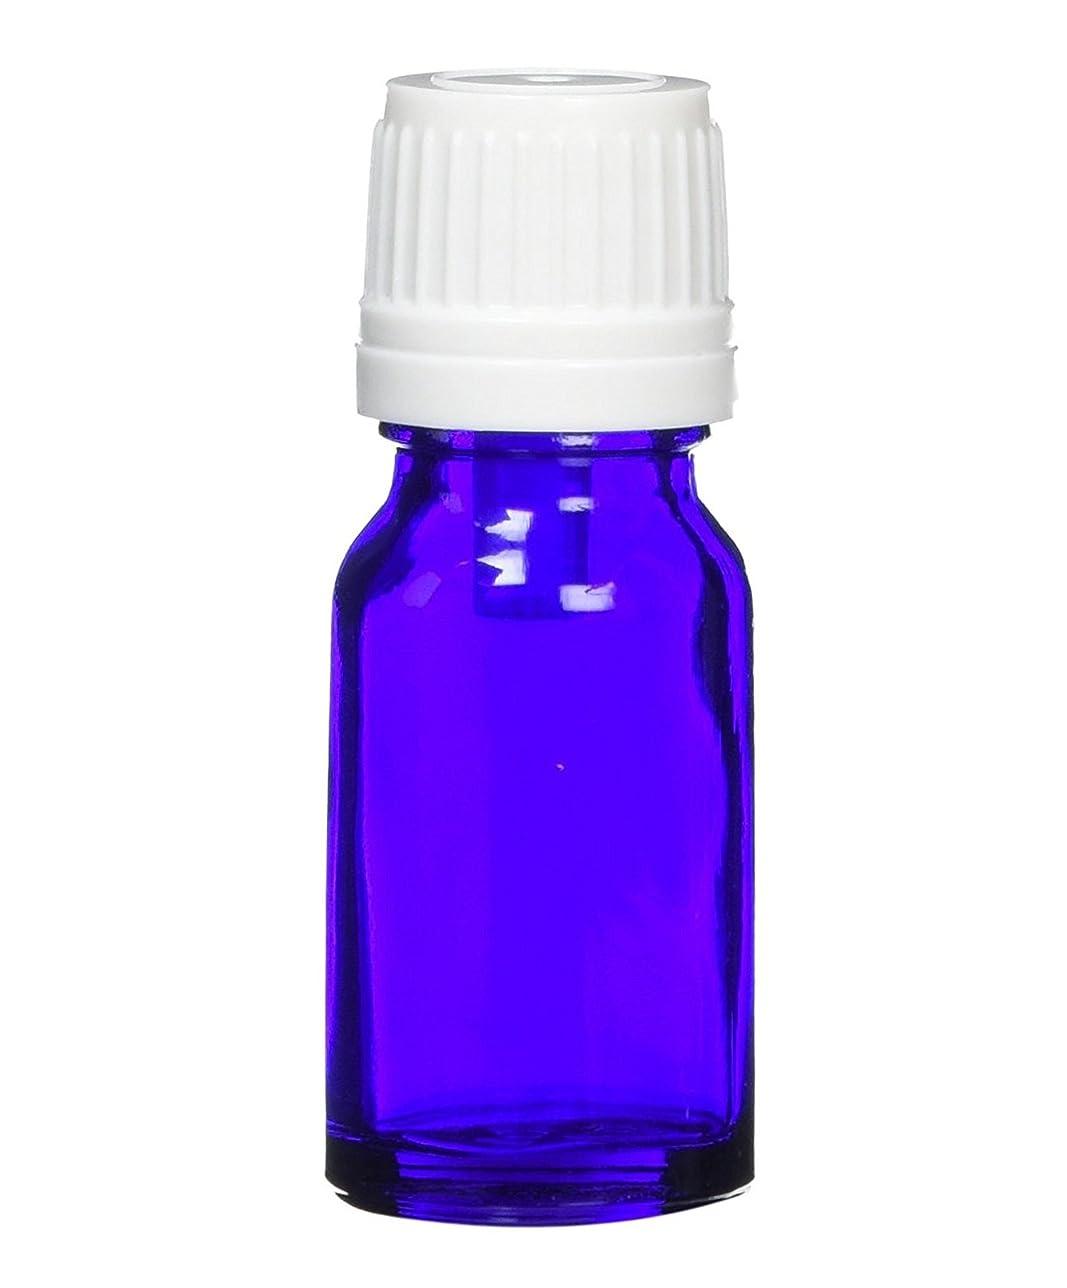 ease 遮光ビン ブルー 10ml×5本